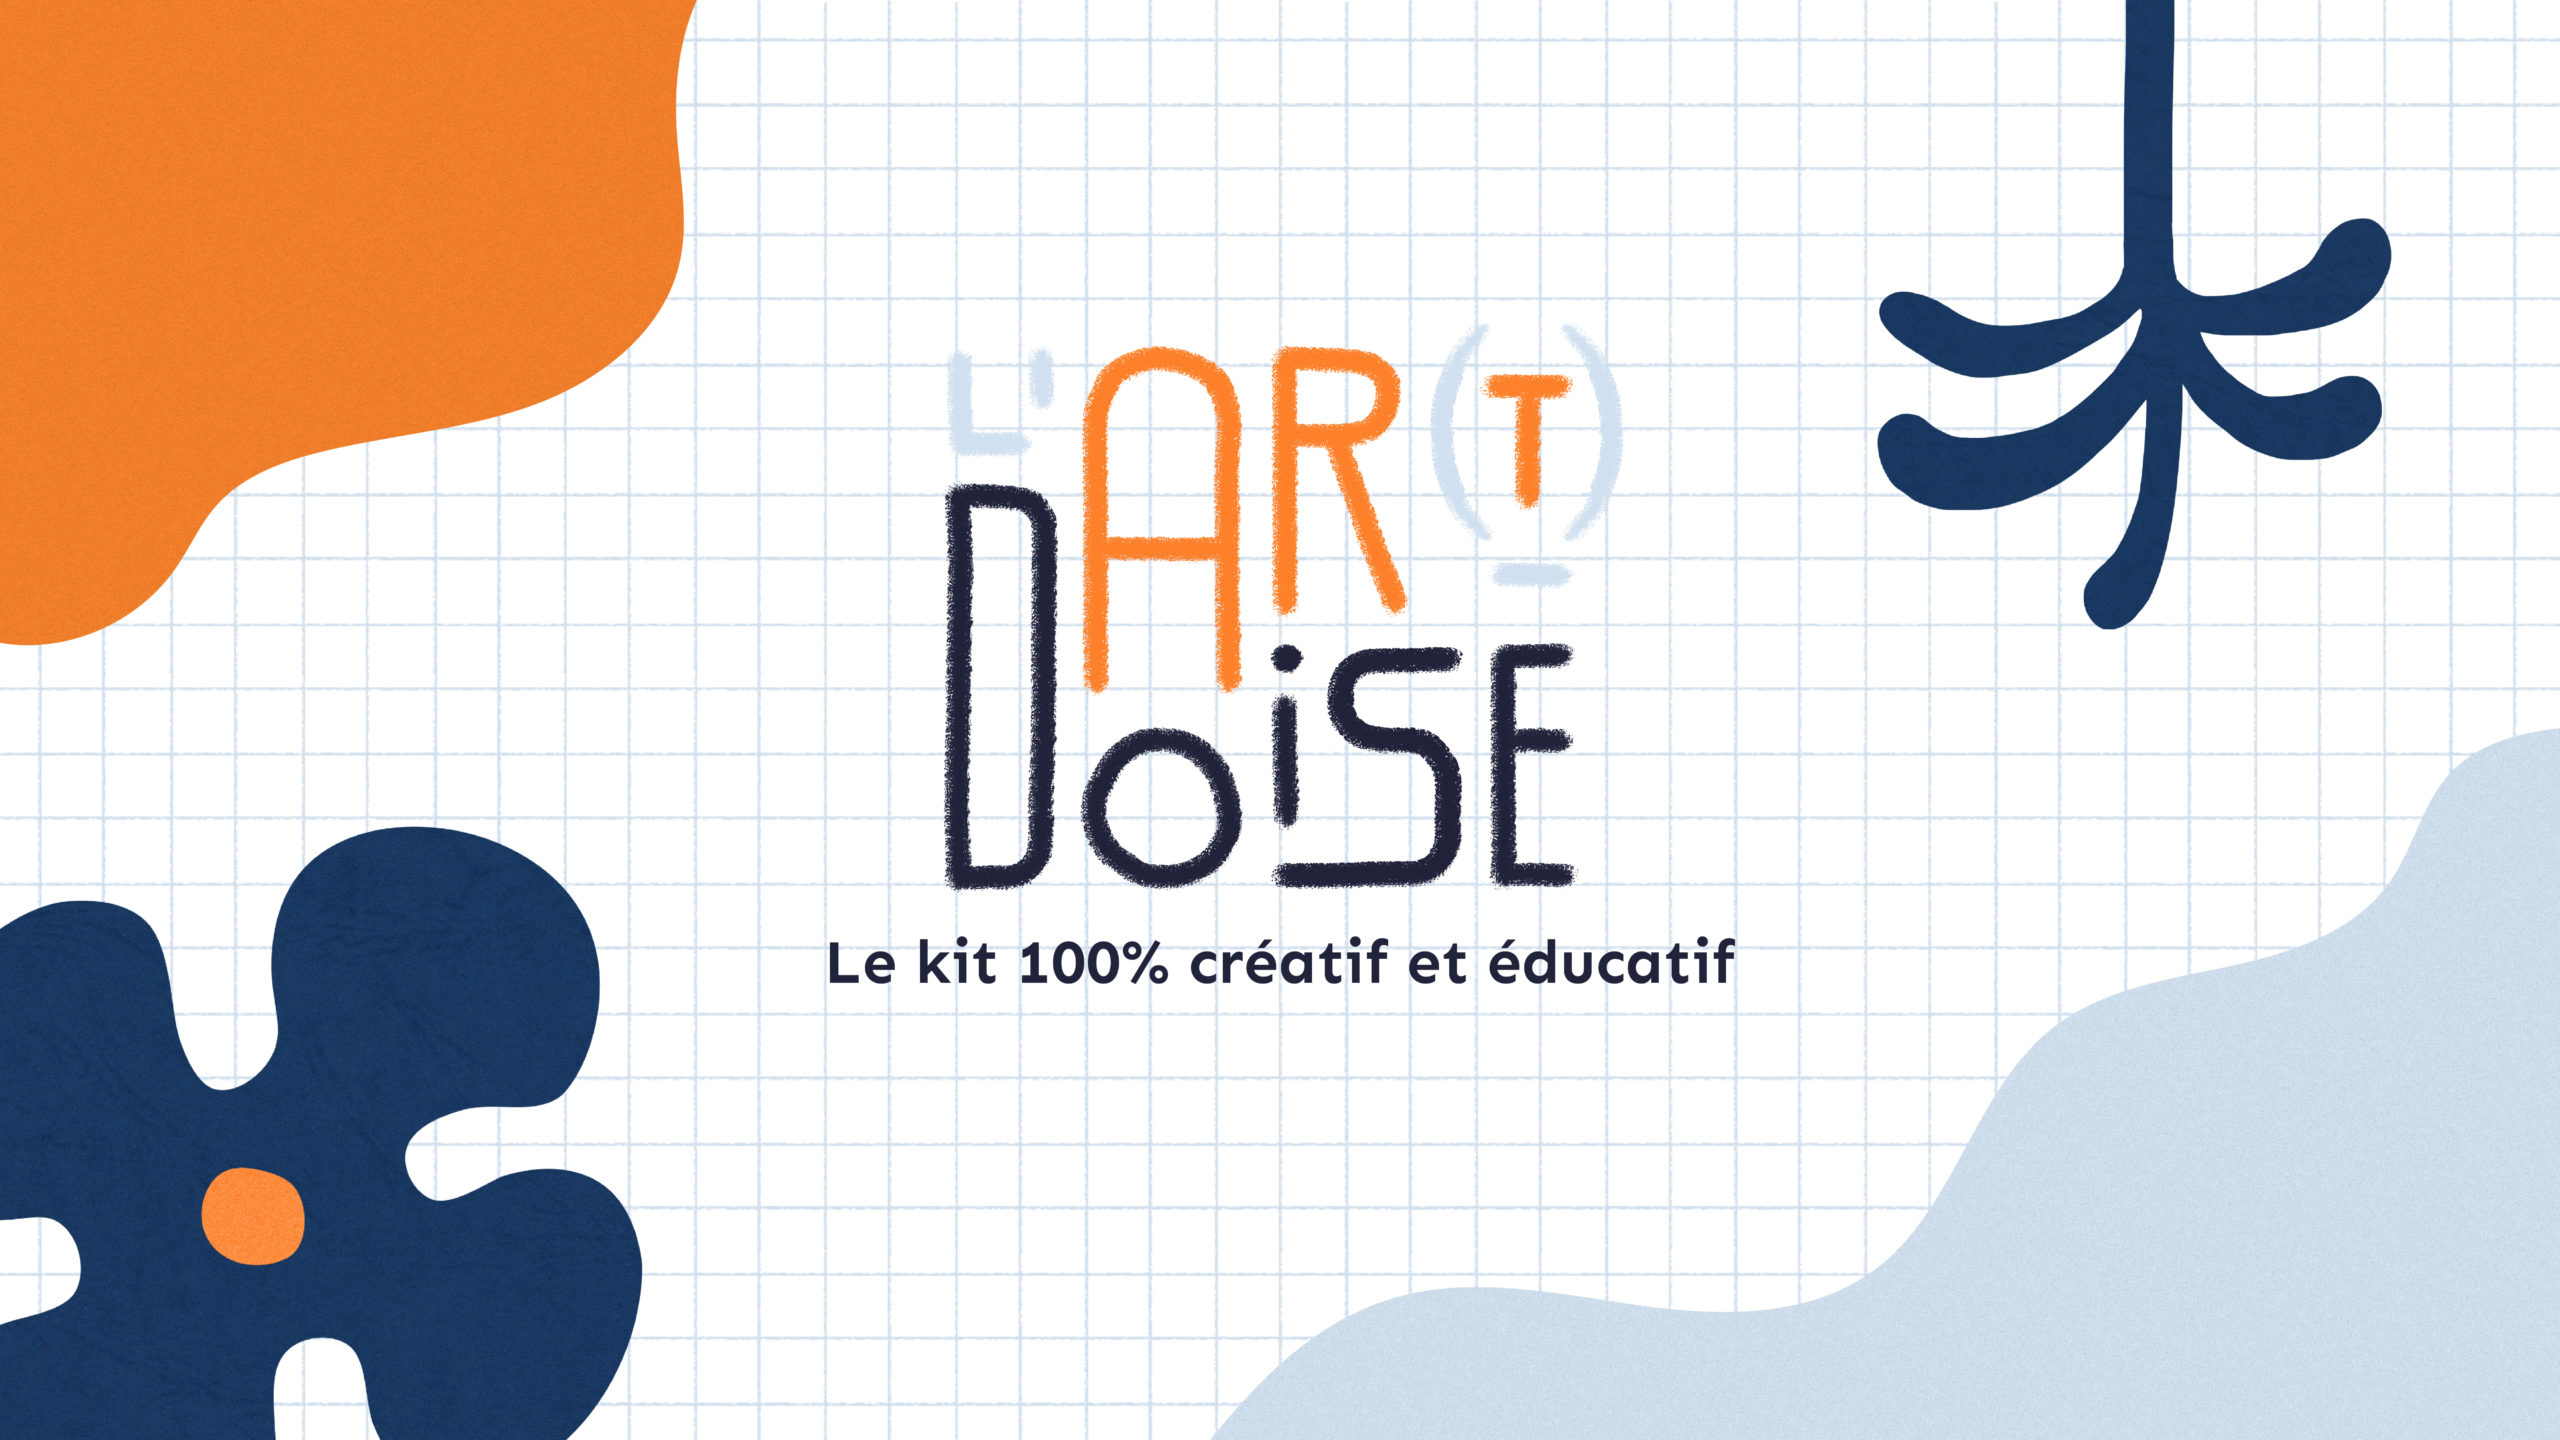 PDF-présentation-lartdoise_1-01